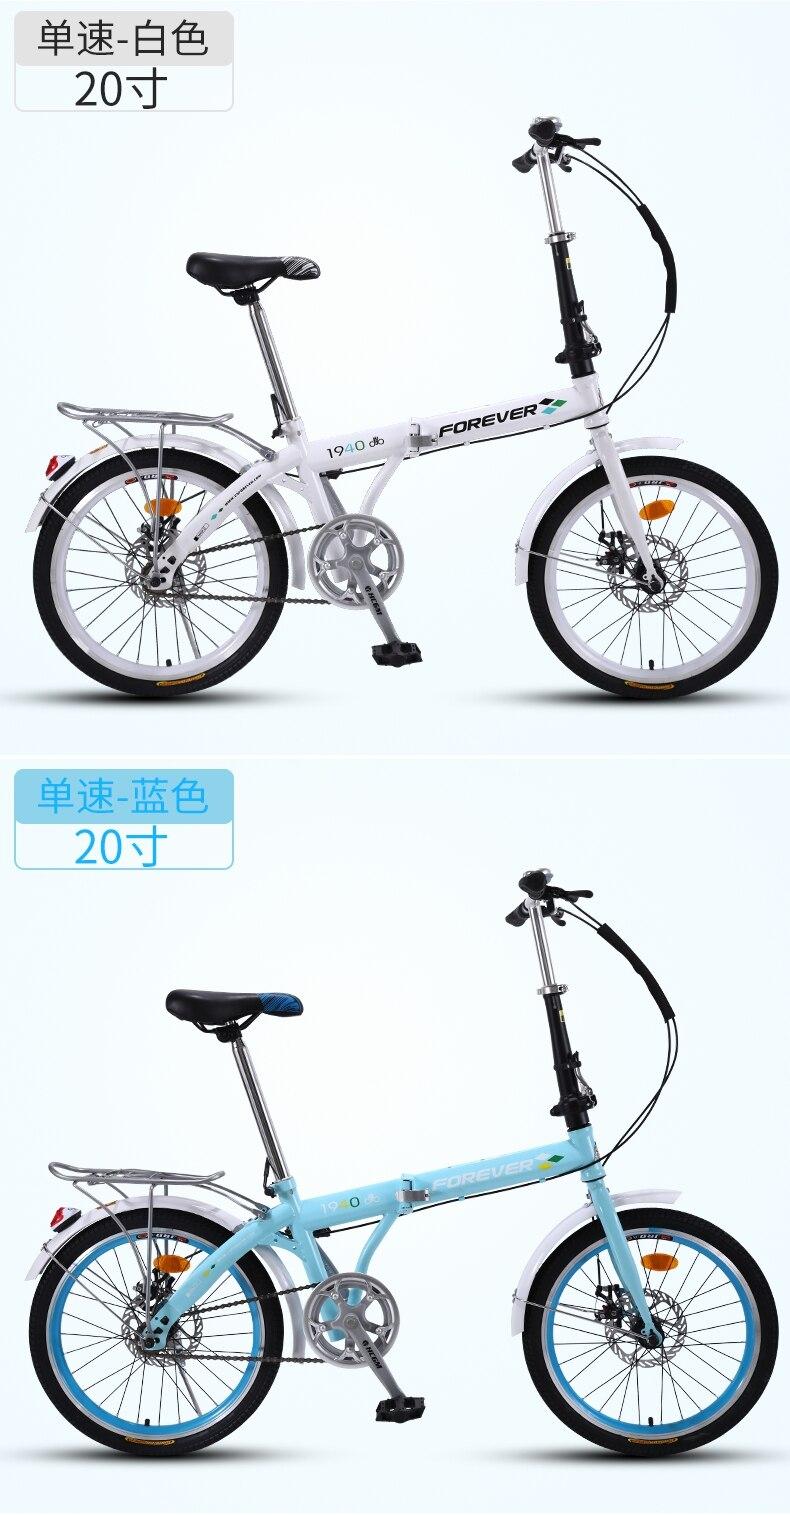 Hb19ff431b6494a729d921806838b895cw 20 inch Mountain bike off-road male female wheel folding bicycle dual disc brakes variable mountain bike bicycles road bike